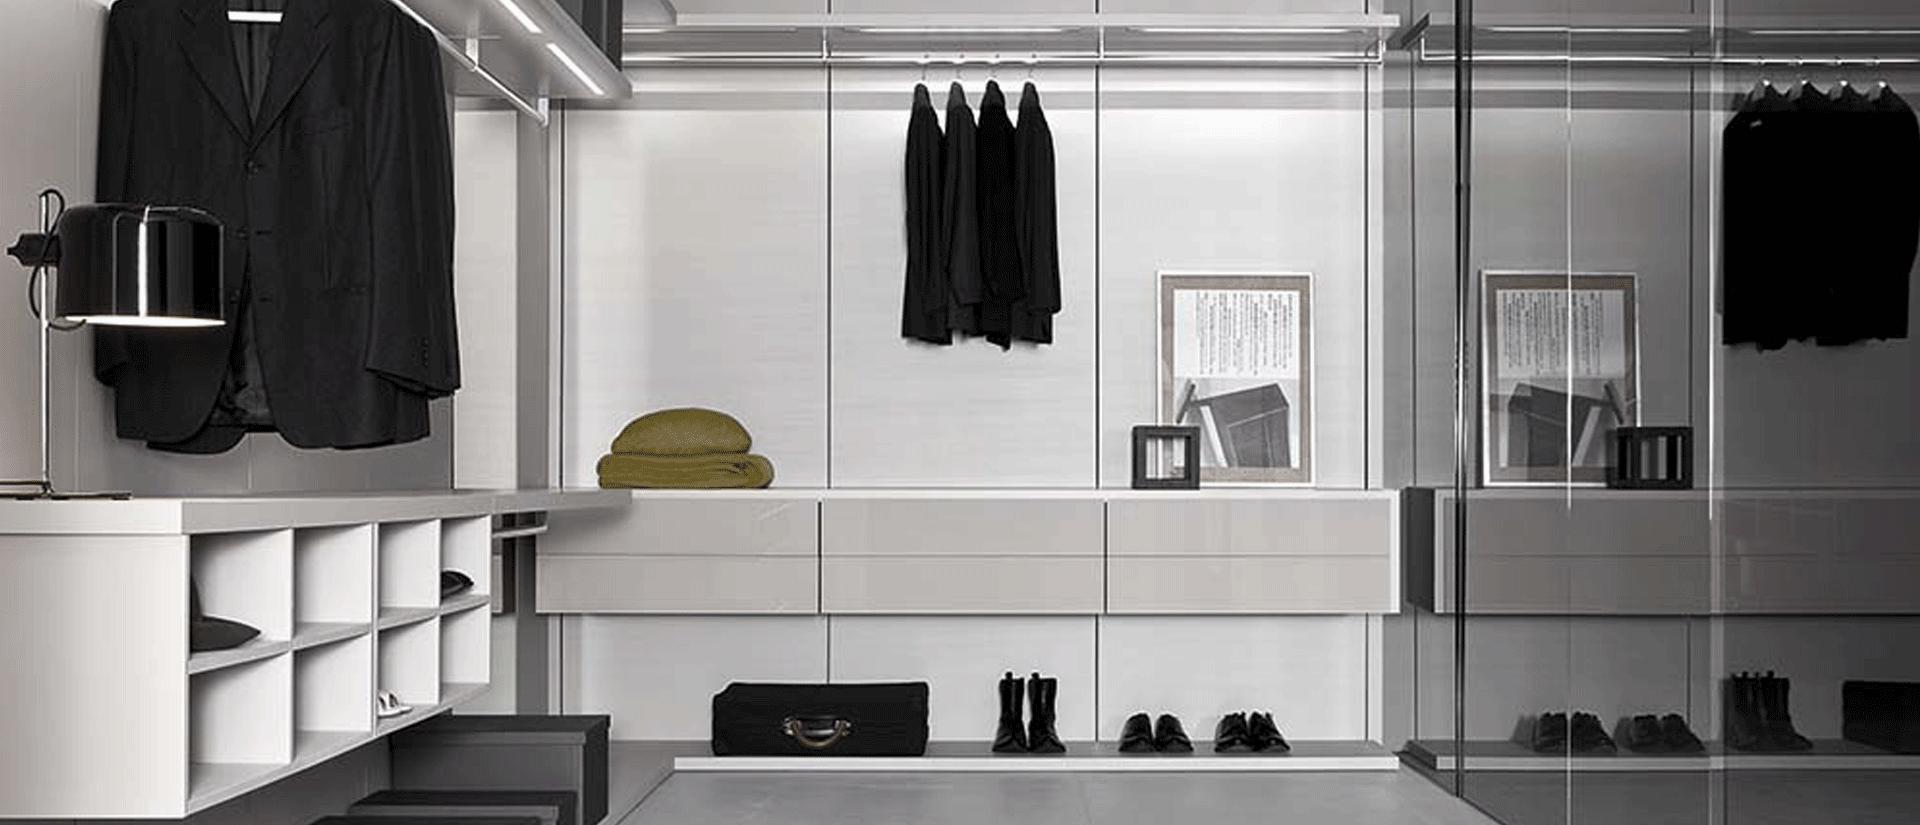 Cabina armadio moderna Anteprima | Scheda Tecnica | Casadesign.org